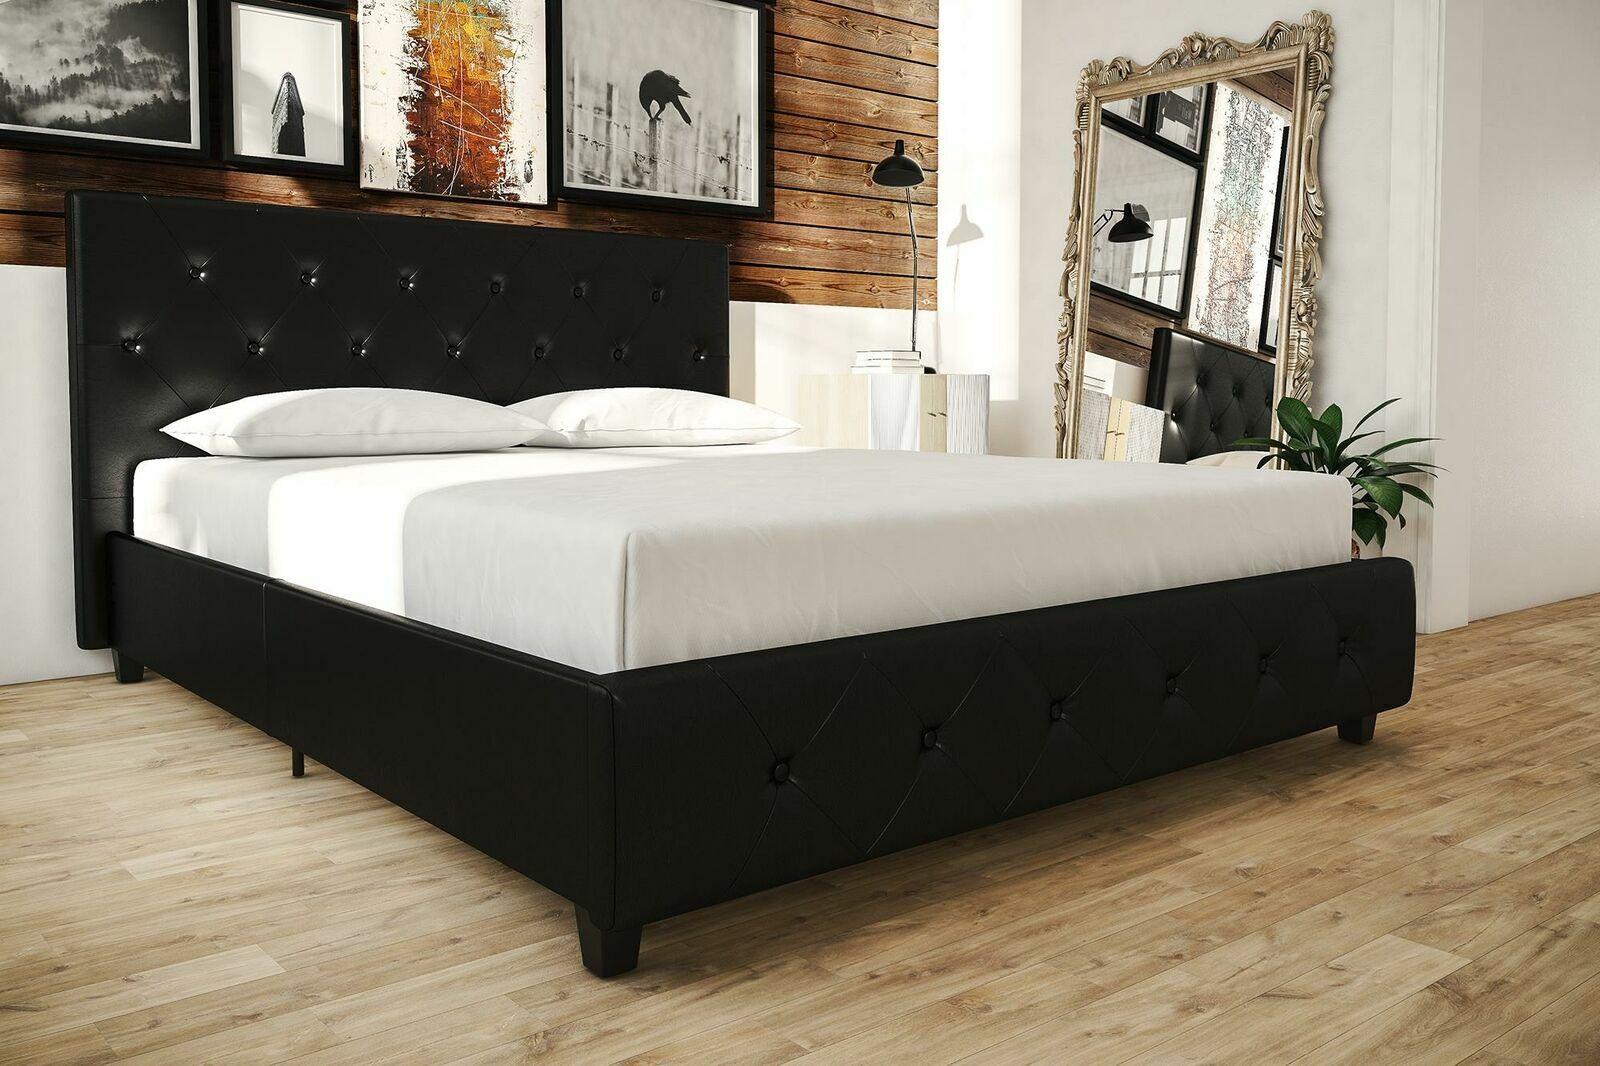 Coaster Tufted Headboard King Upholstered Bed For Sale Online Ebay